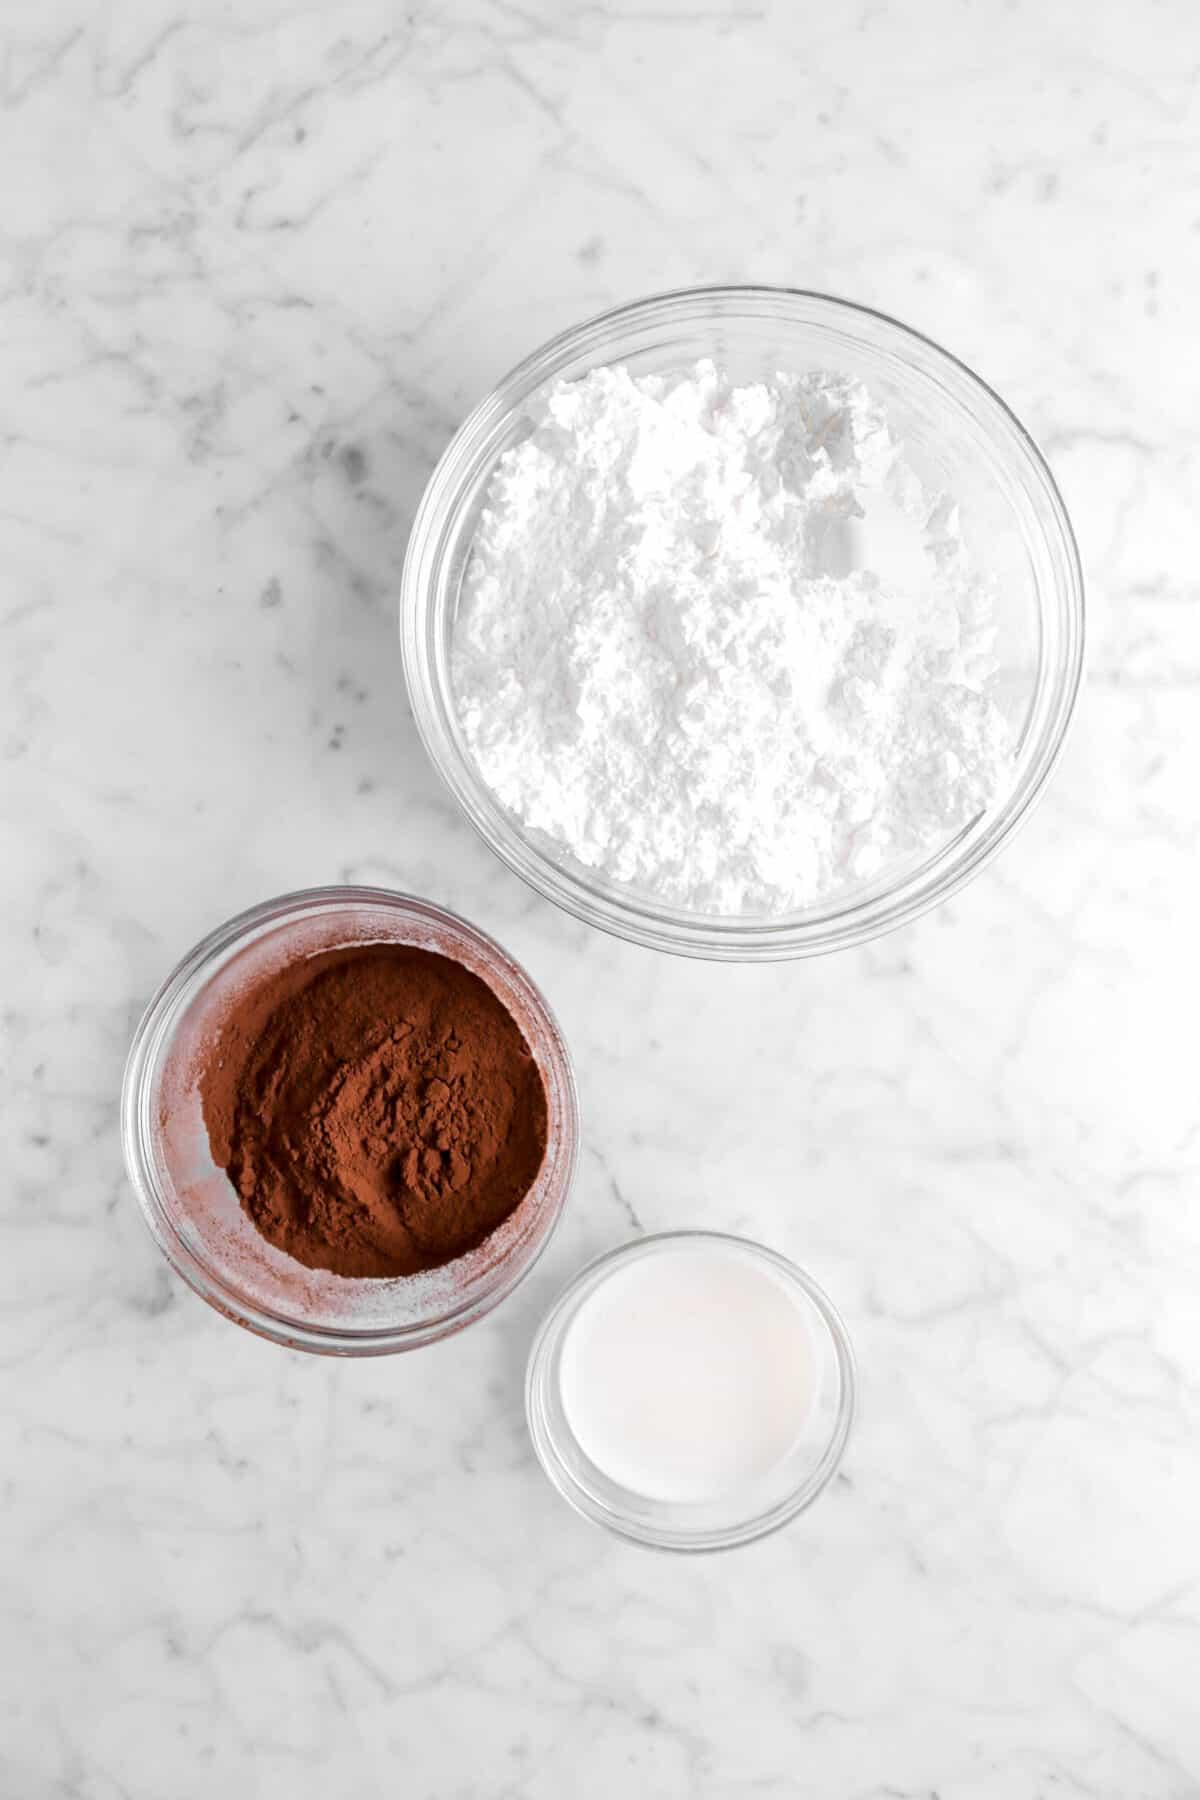 powdered sugar, cocoa powder, and milk in glass bowls